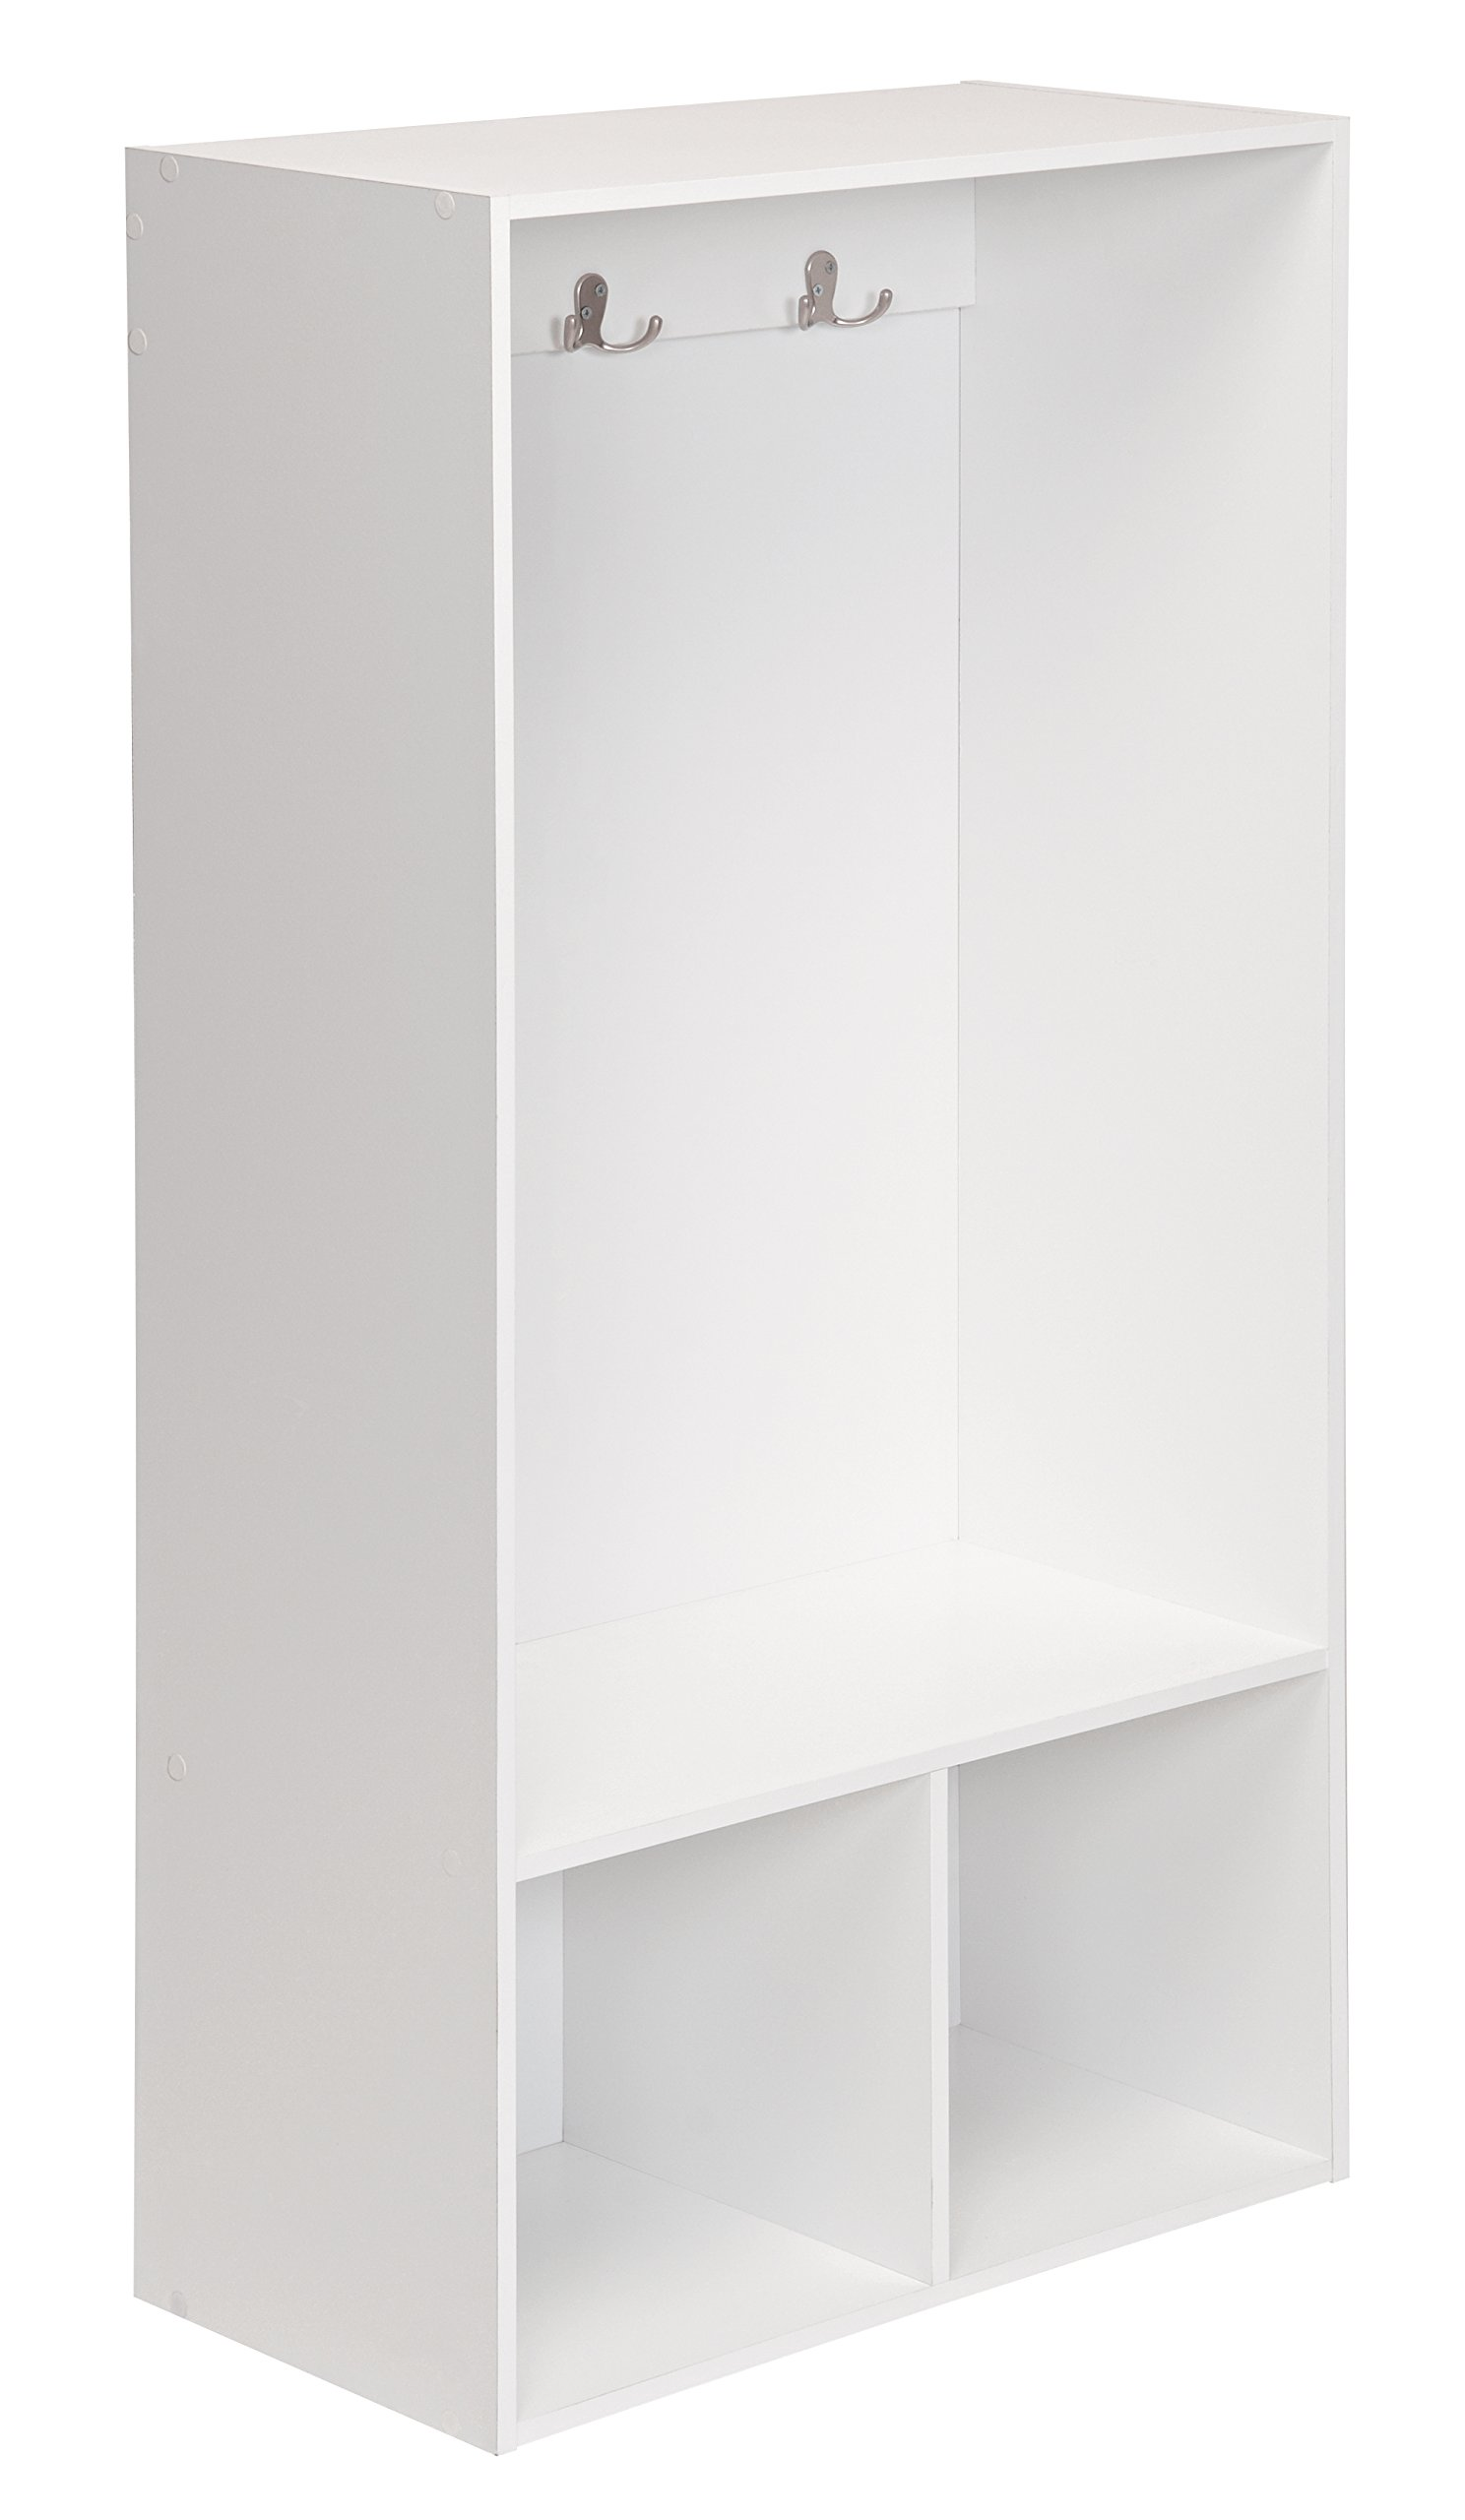 ClosetMaid 1598 KidSpace Open Storage Locker, 47-Inch Height, White